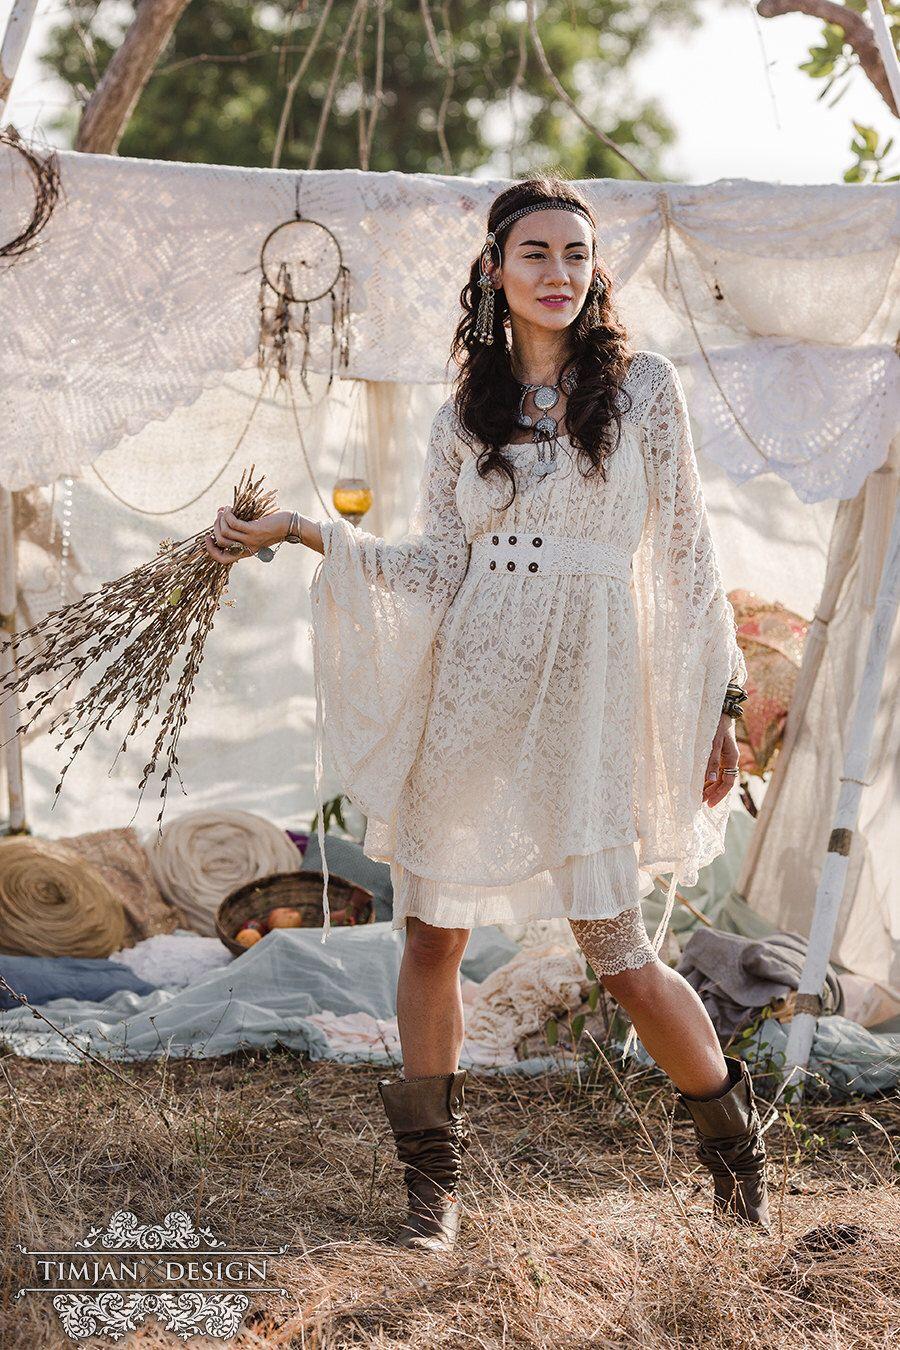 Empress Bohemian Dress Lace Hippie Boho Wedding Bride Romantic